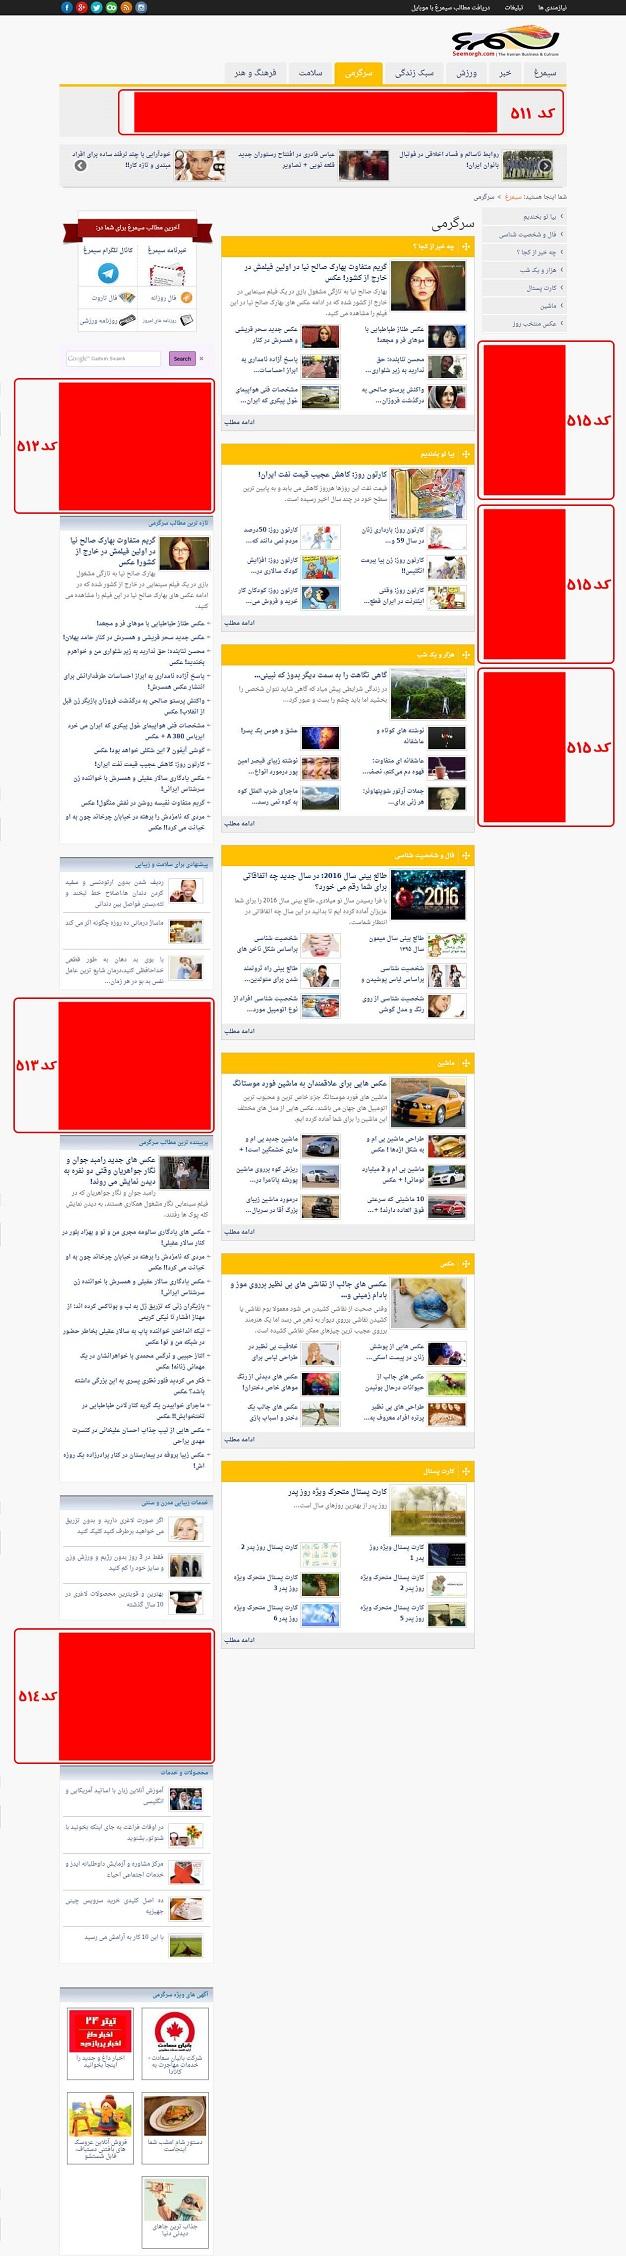 5-seemorgh-banner-entertainment.jpg